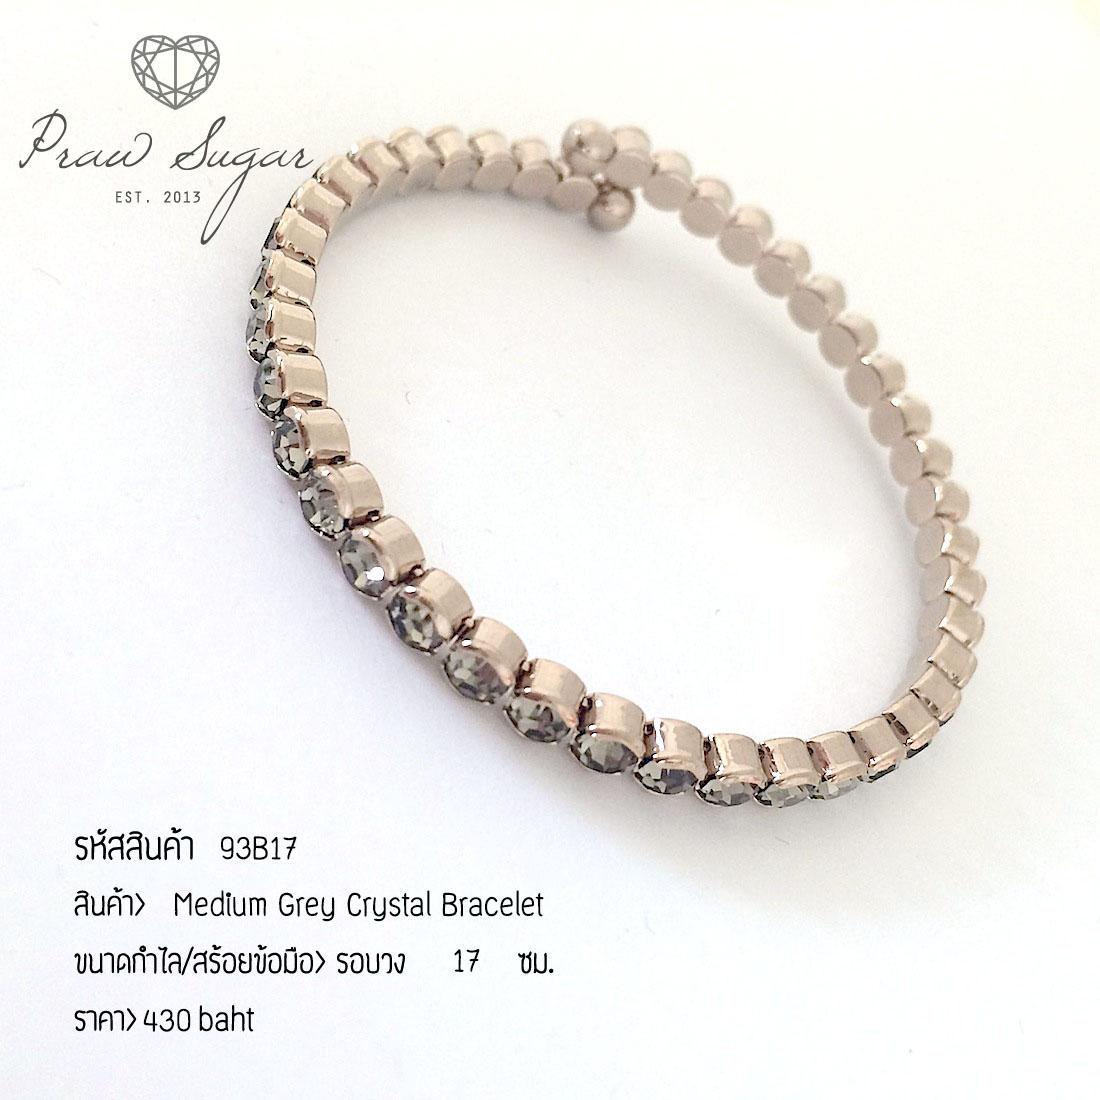 Medium Grey Crystal Bracelet